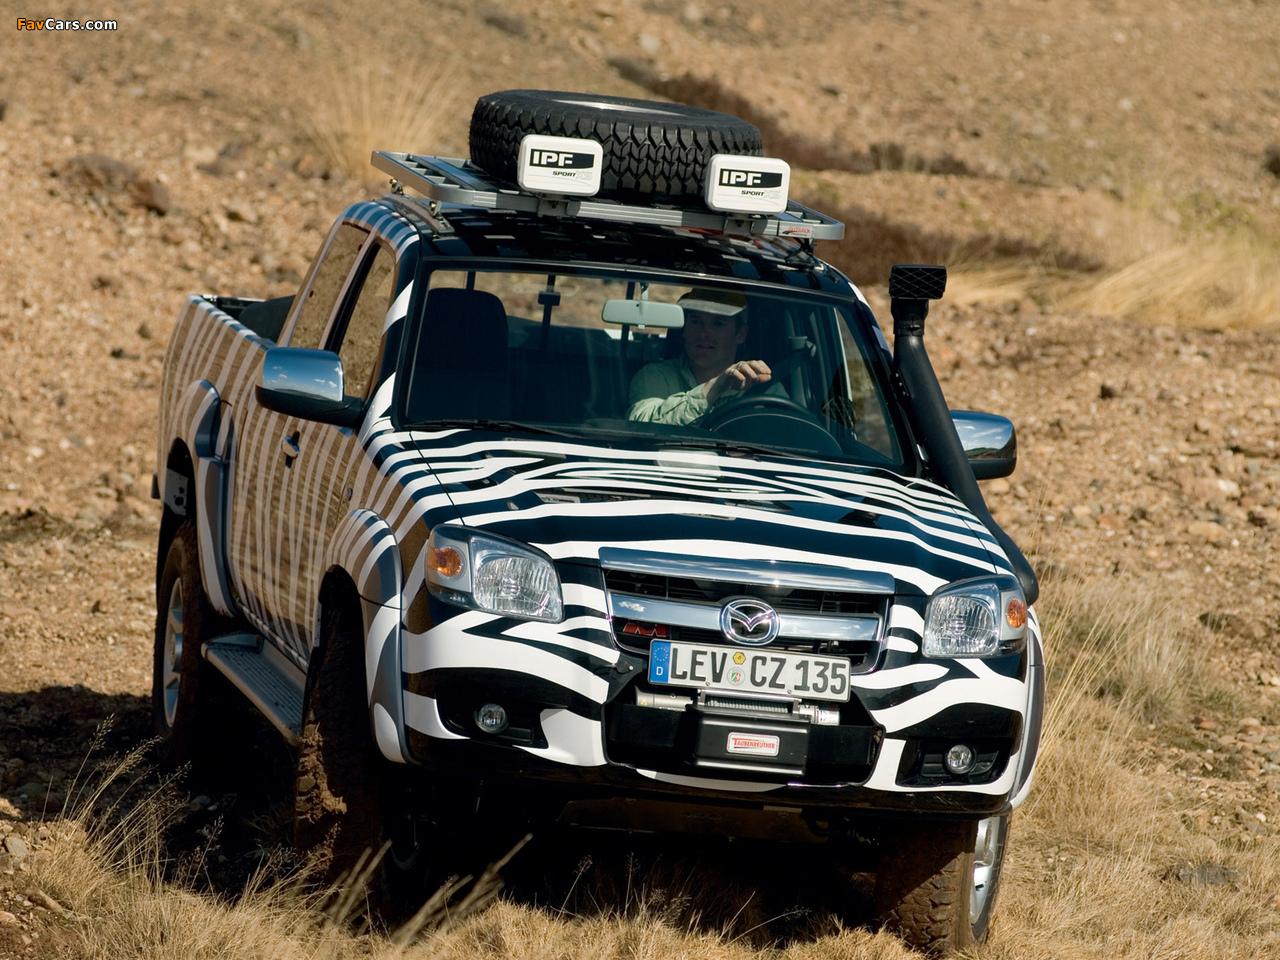 Photos of Mazda BT-50 Freestyle Cab (J97M) 2006-08 (1280x960)